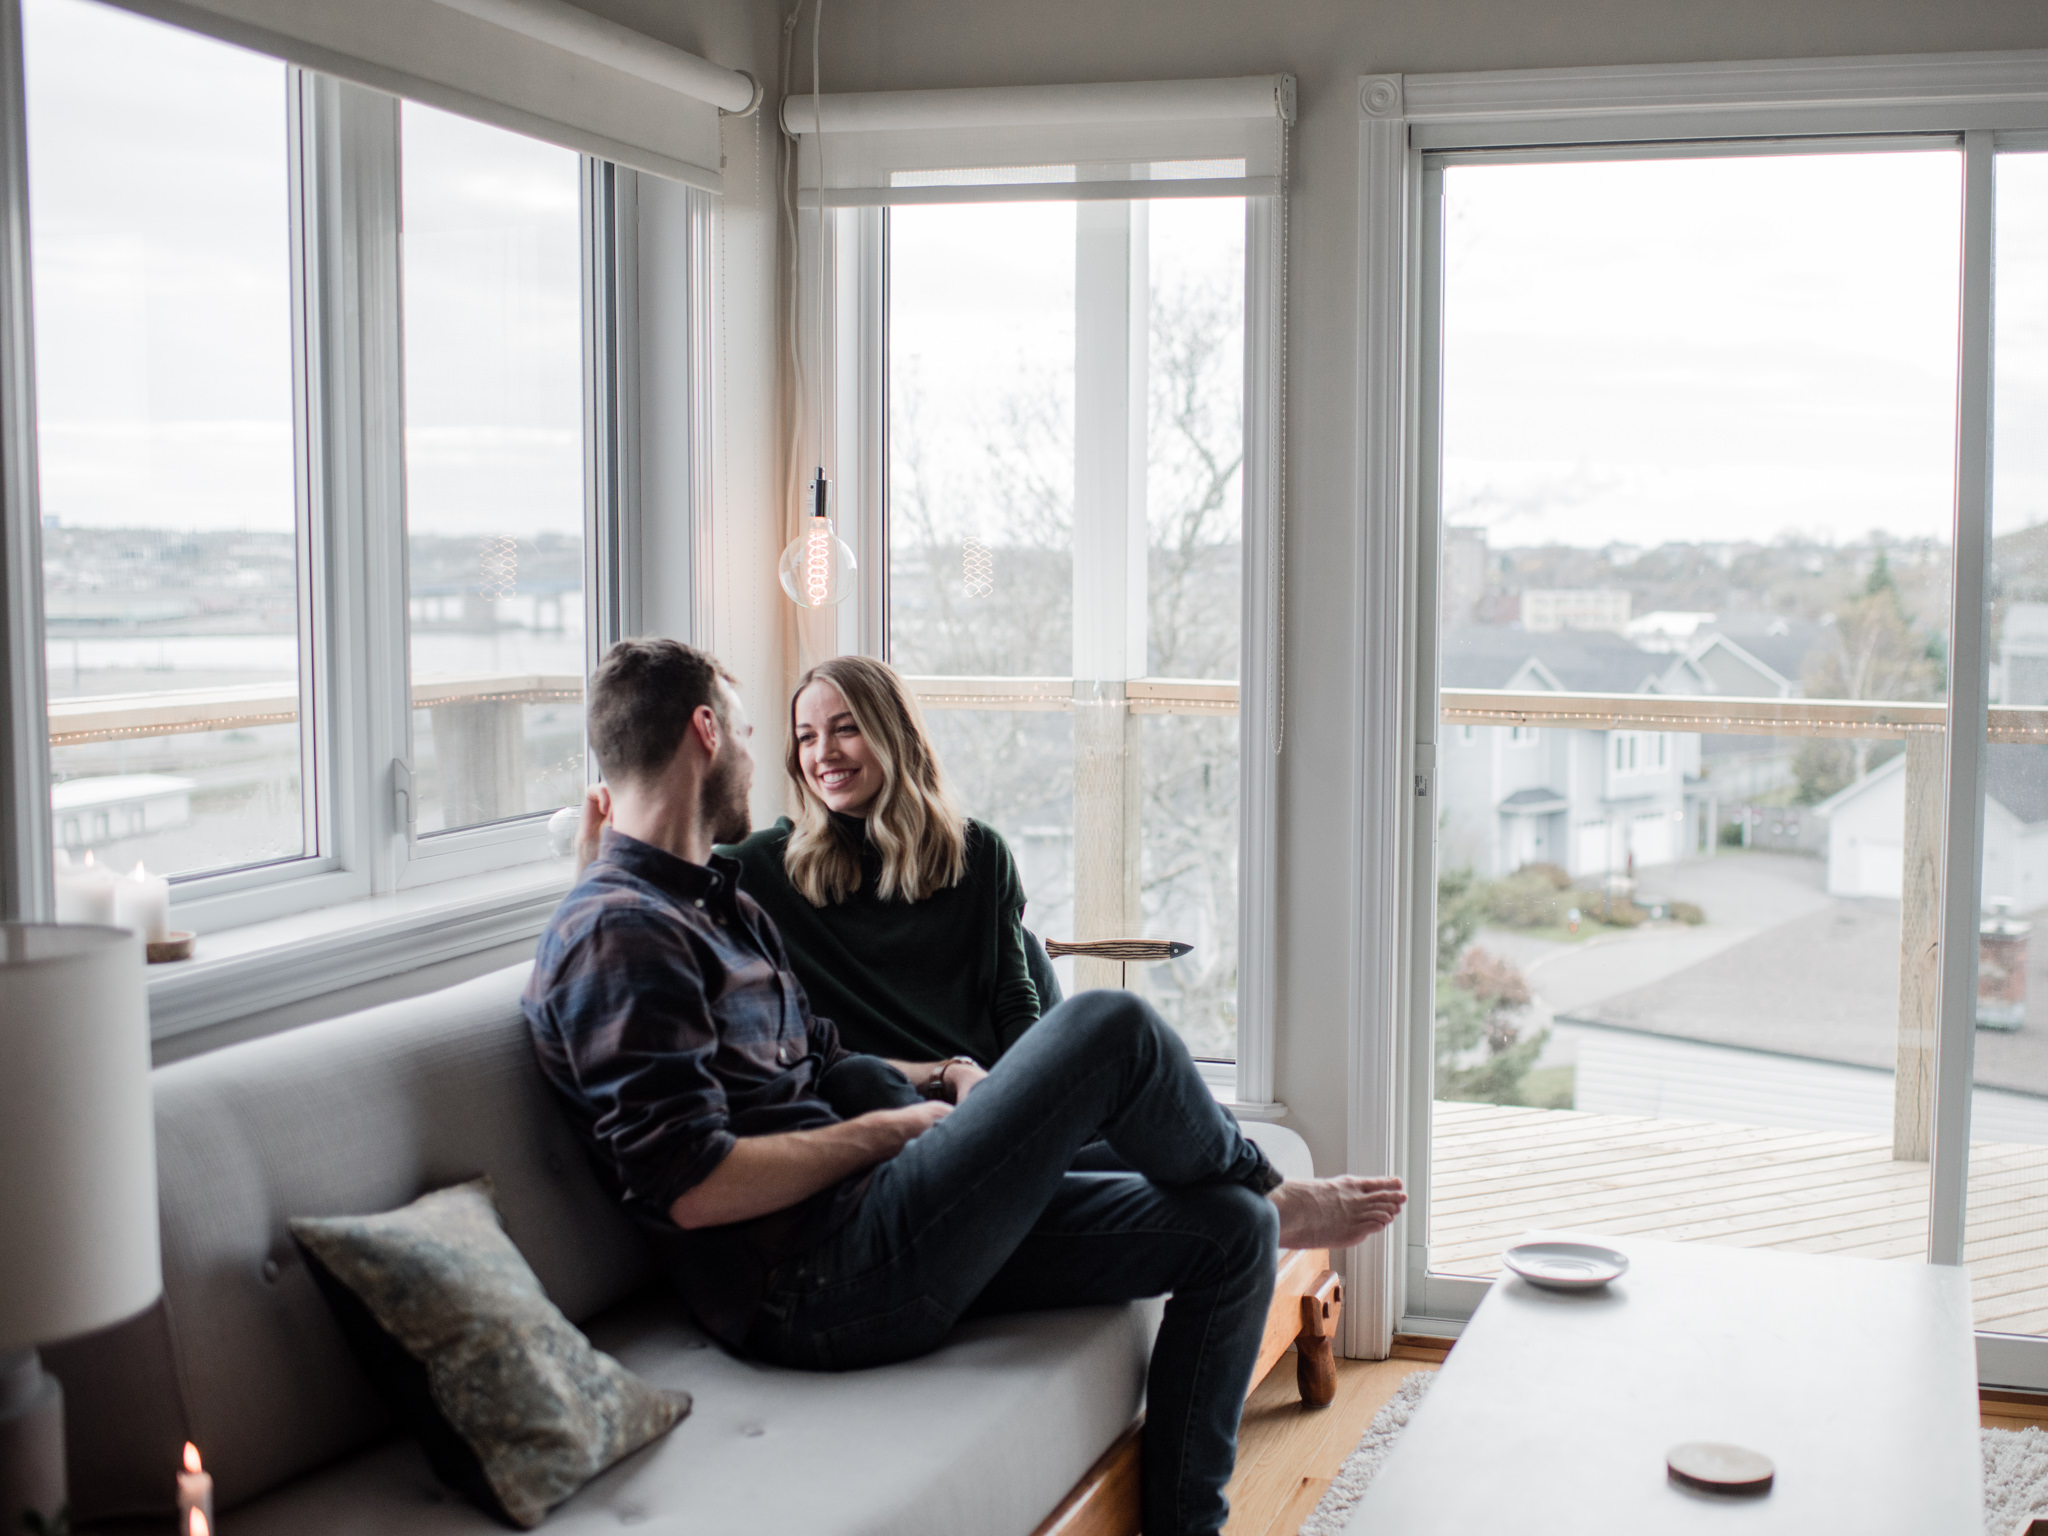 intimate-at-home-engagement-toronto-saint-john-13.jpg